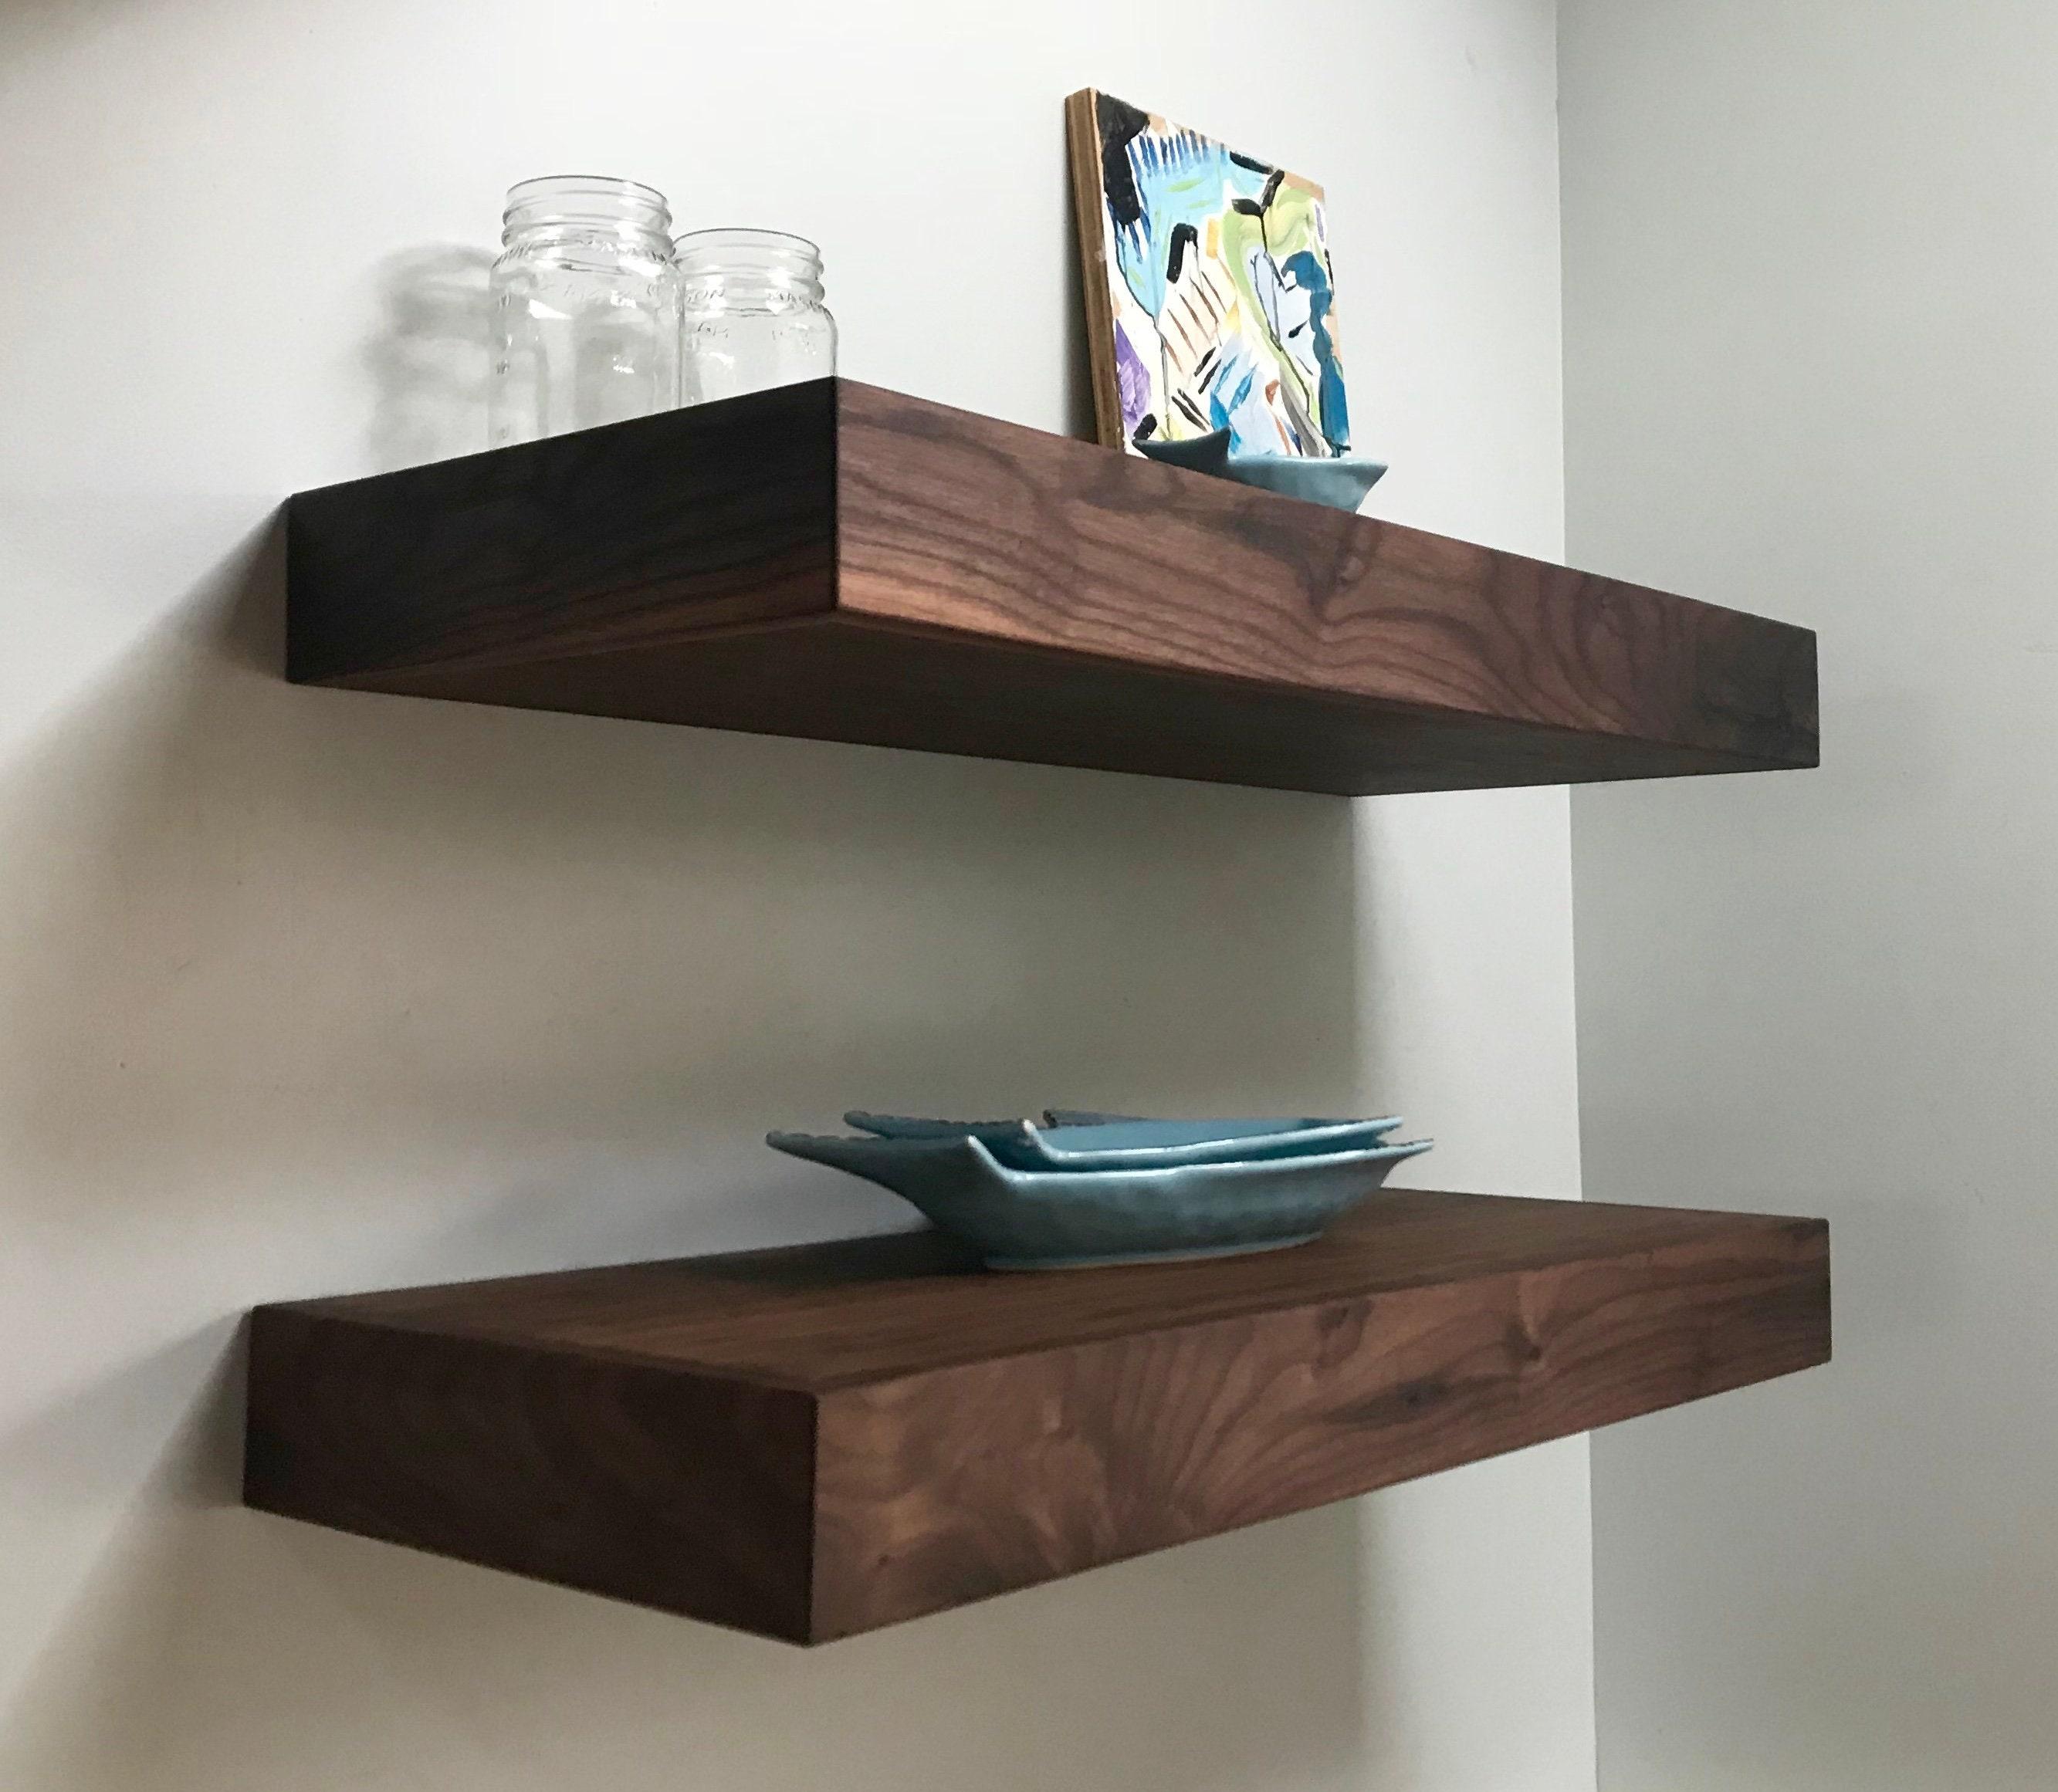 Floating Shelves Walnut Kitchen Shelves Custom For Zuzana Two 3x10x42 And Two 3x11 5x23 25